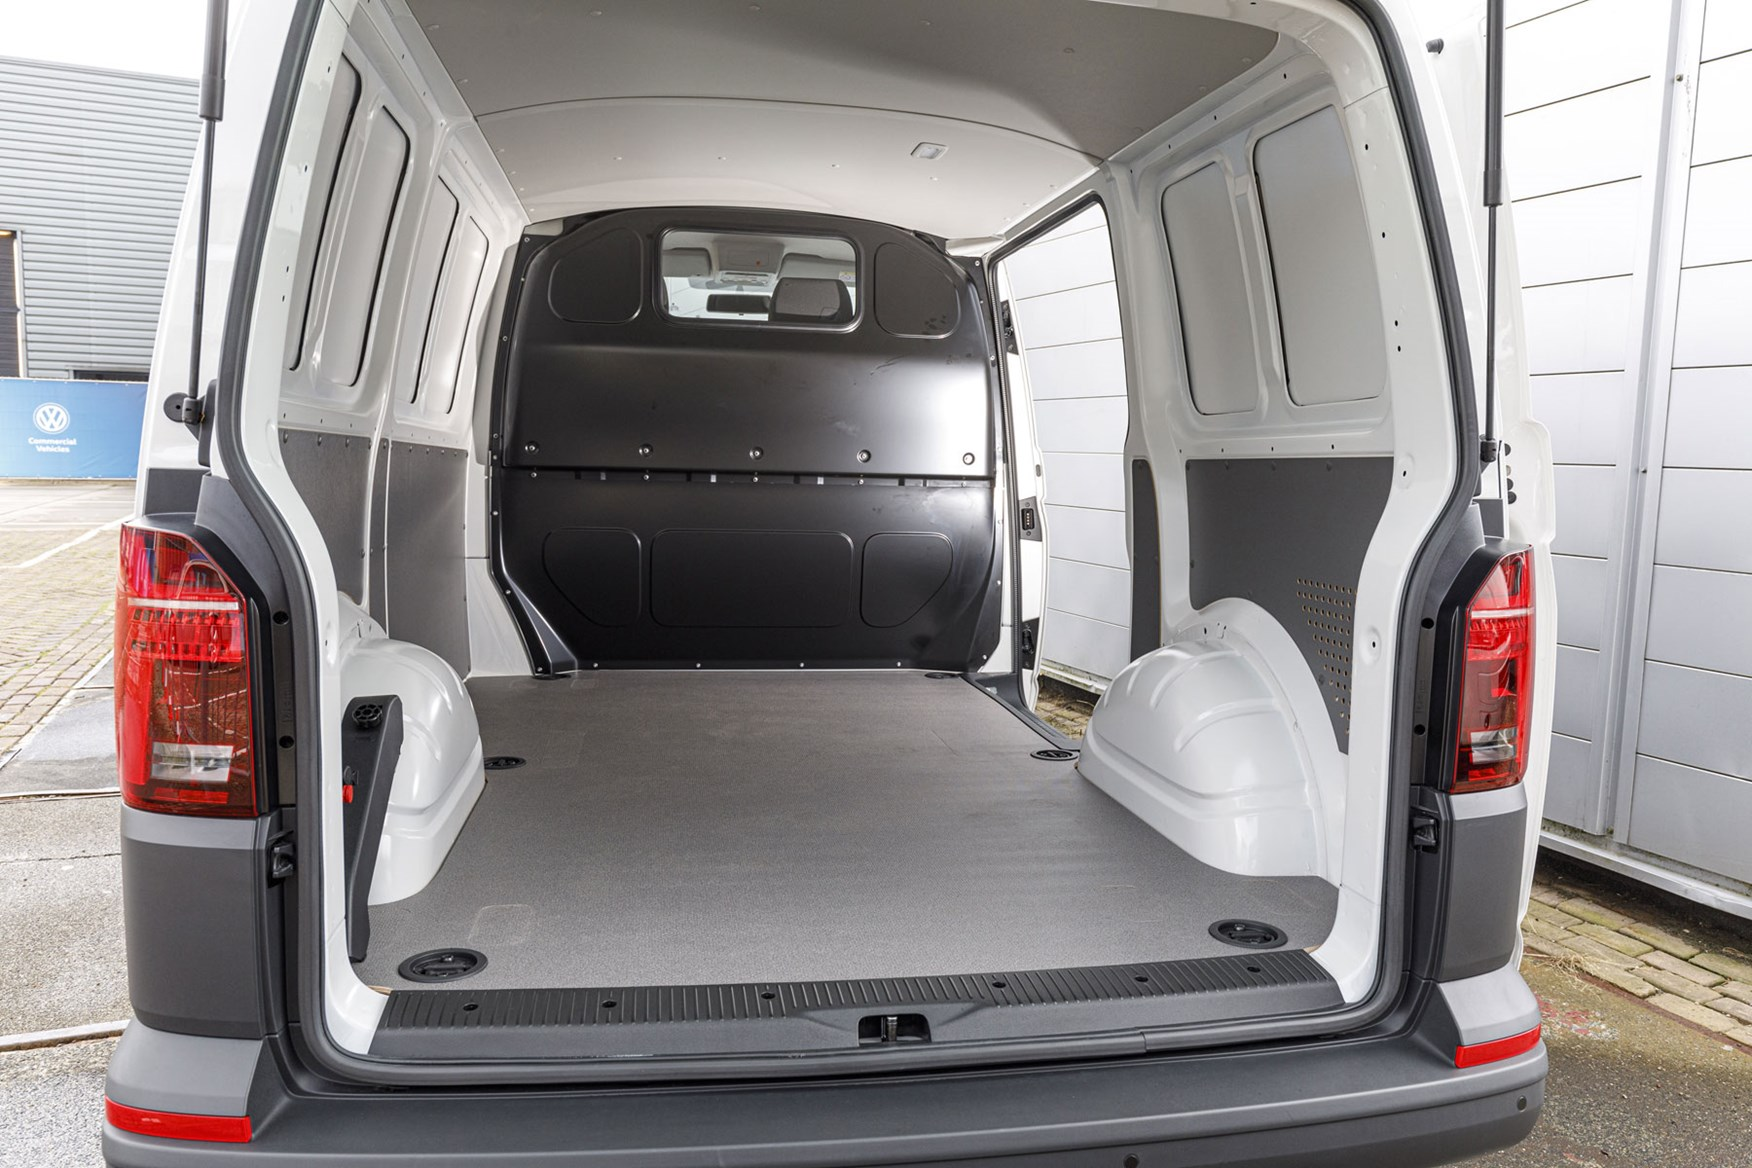 Volkswagen Transporter Van Dimensions 2015 On Capacity Payload Volume Towing Parkers